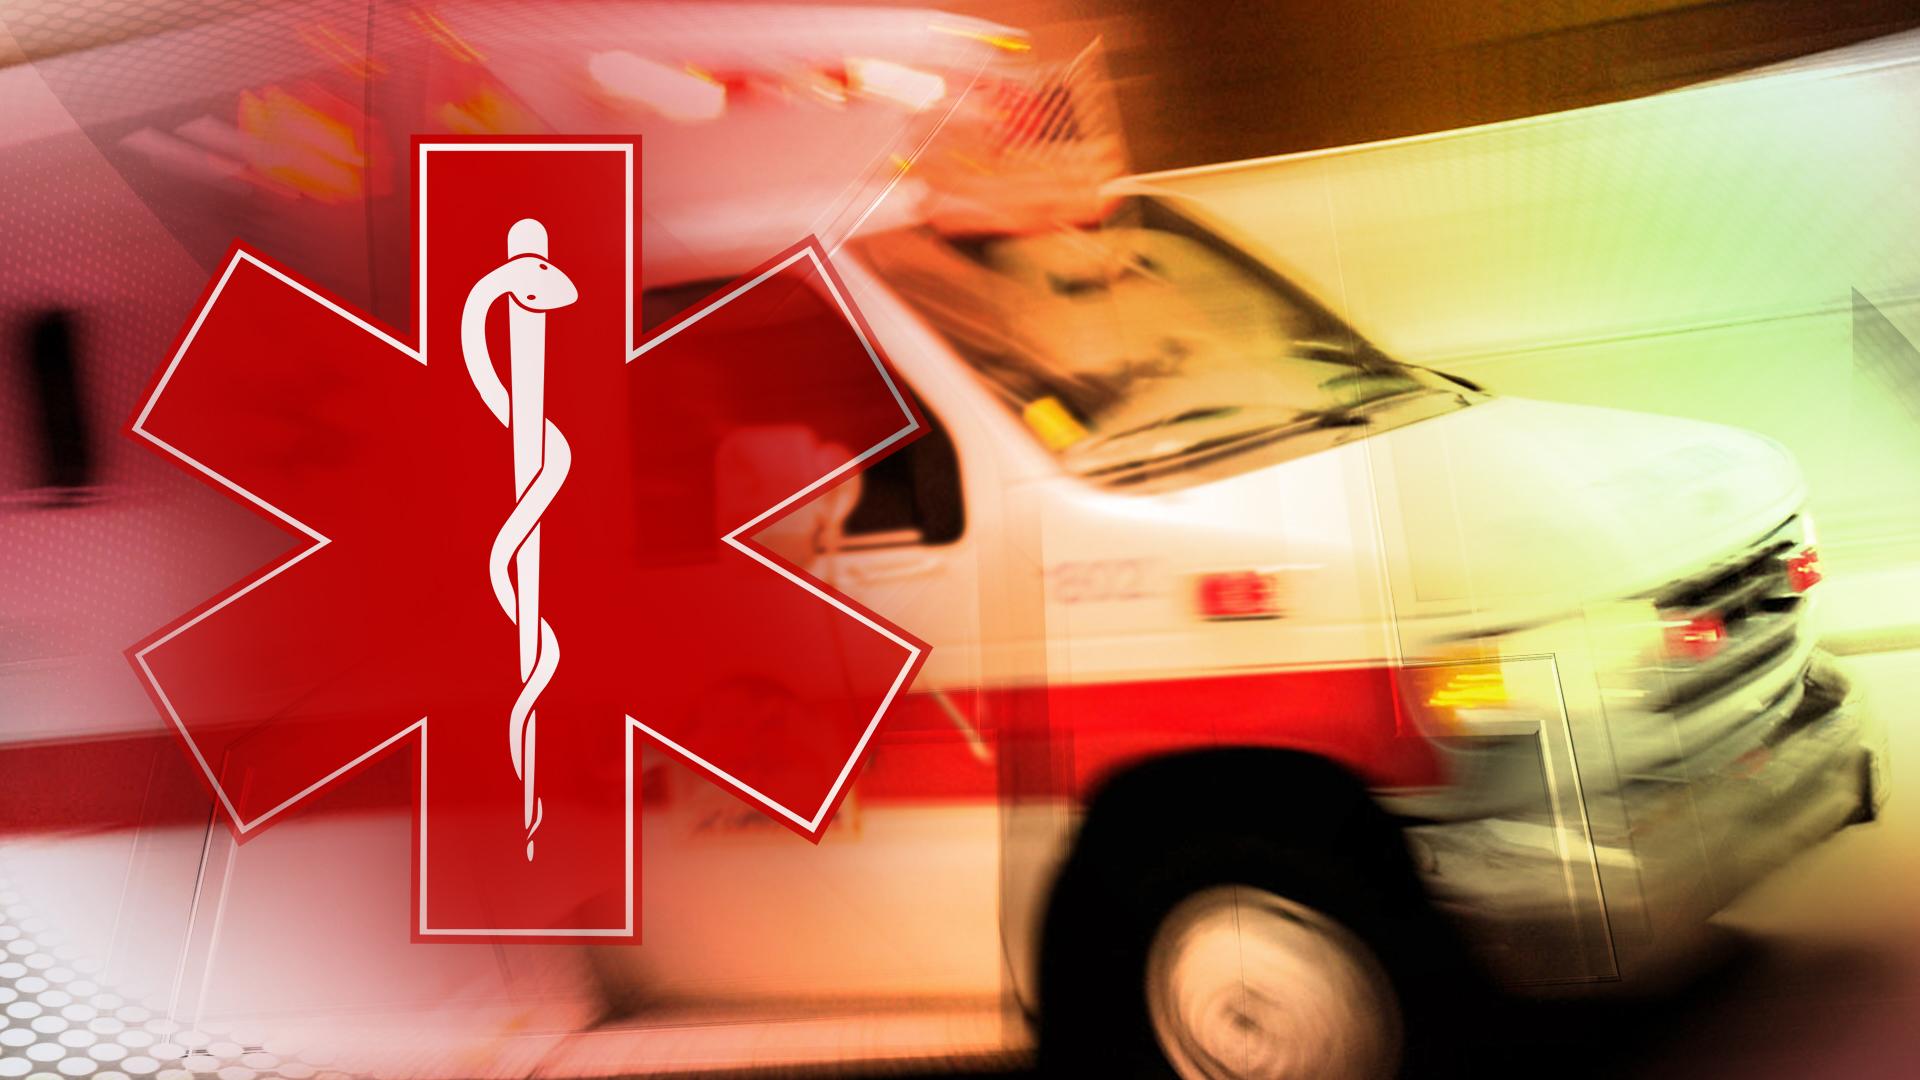 FS Ambulance_1556641691032.jpg.jpg